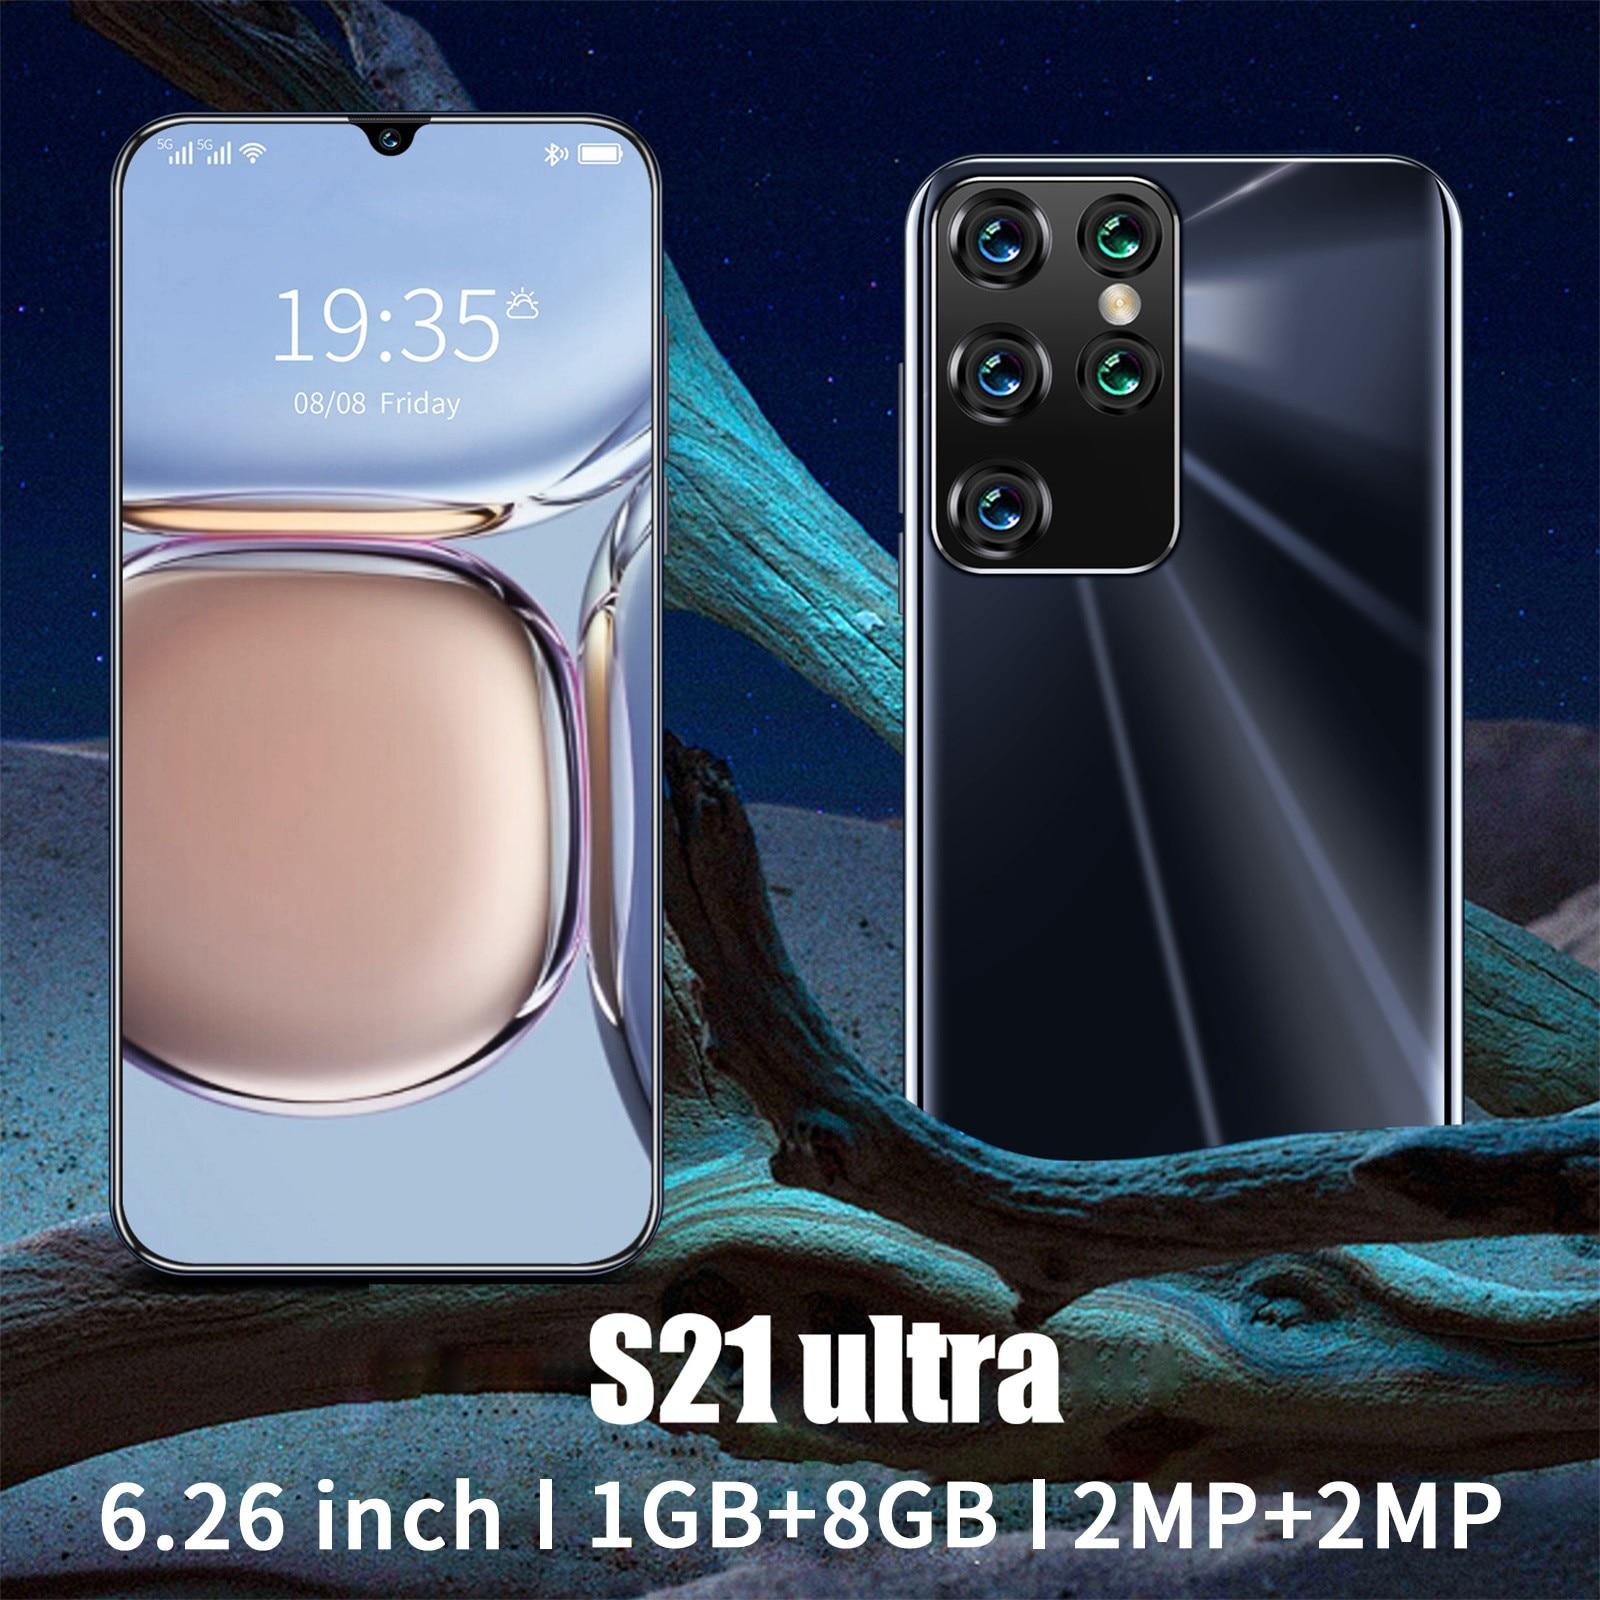 S21 الترا الهاتف الذكي أندرويد 6.26 بوصة 1G RAM + 8G ROM كامل الشاشة خمسة الخلفية HD كاميرا الهاتف الذكي 1532*720 القرار